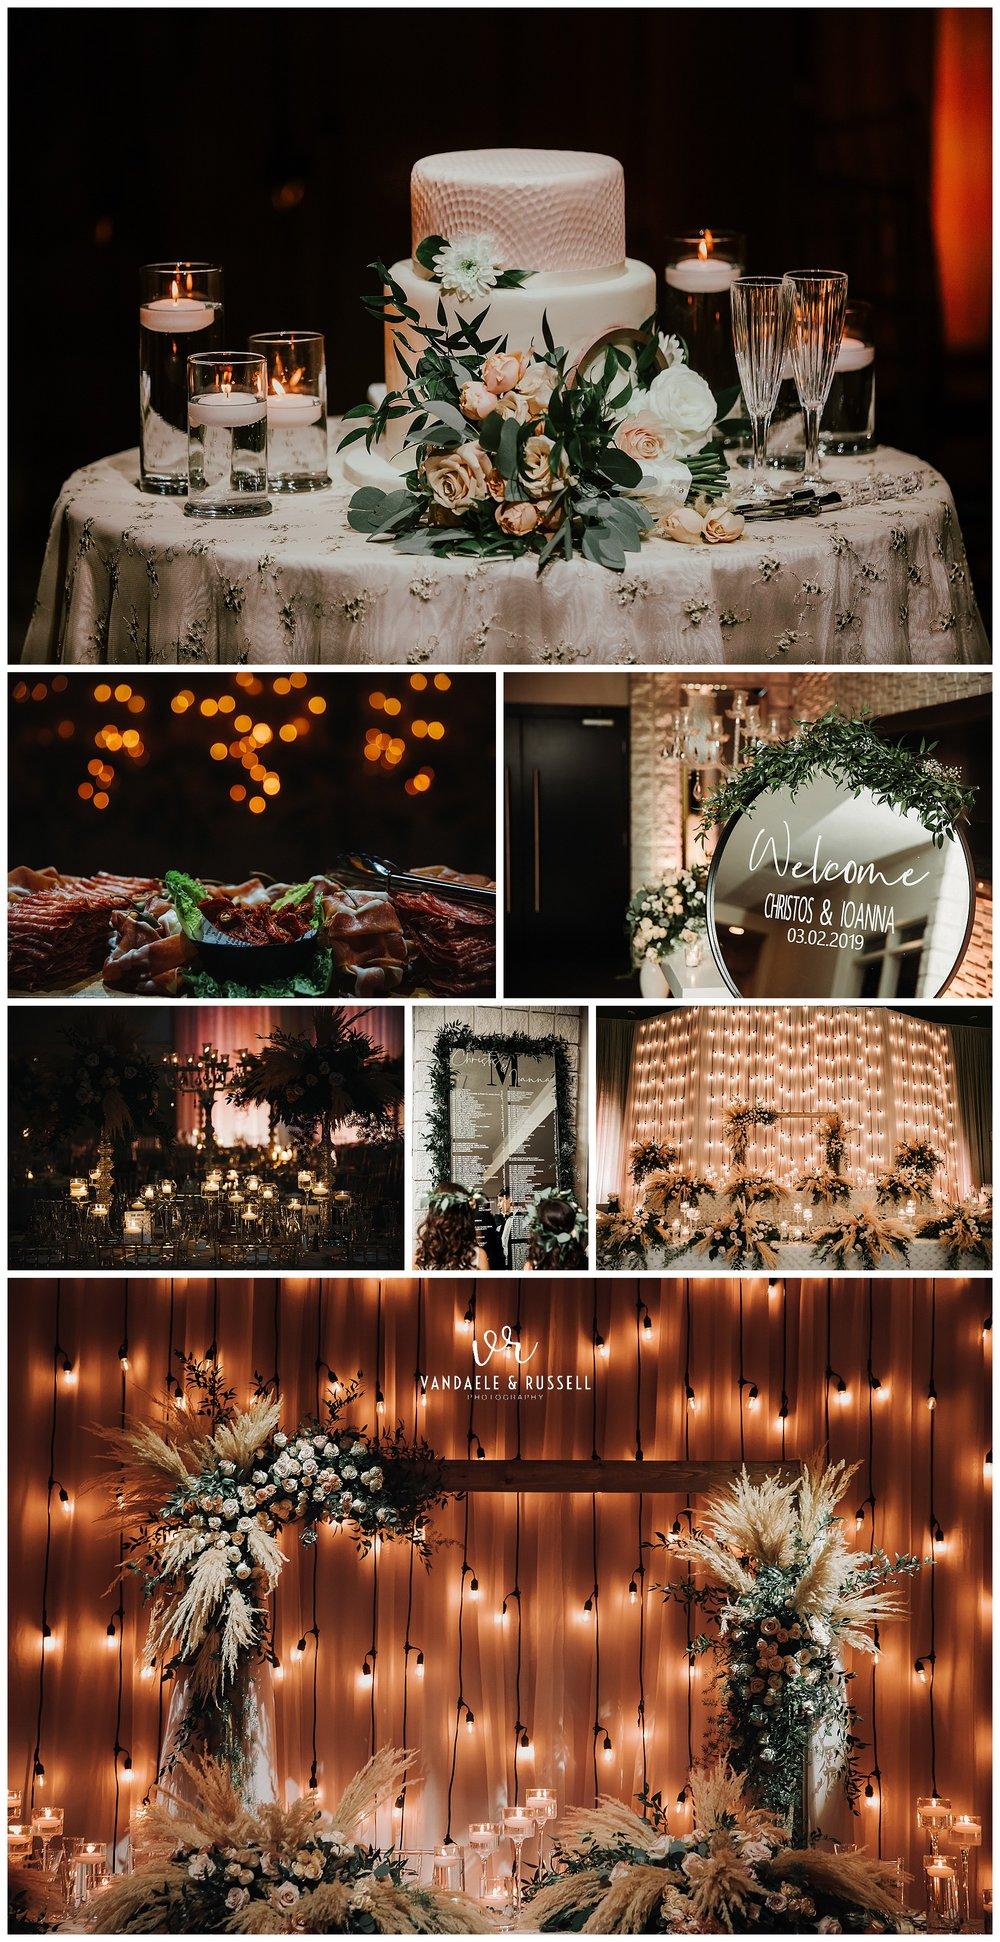 Joanna-Christos-Grand-Luxe-Wedding-Photos-Mint-Room-Toronto-VanDaele-Russell_0097.jpg